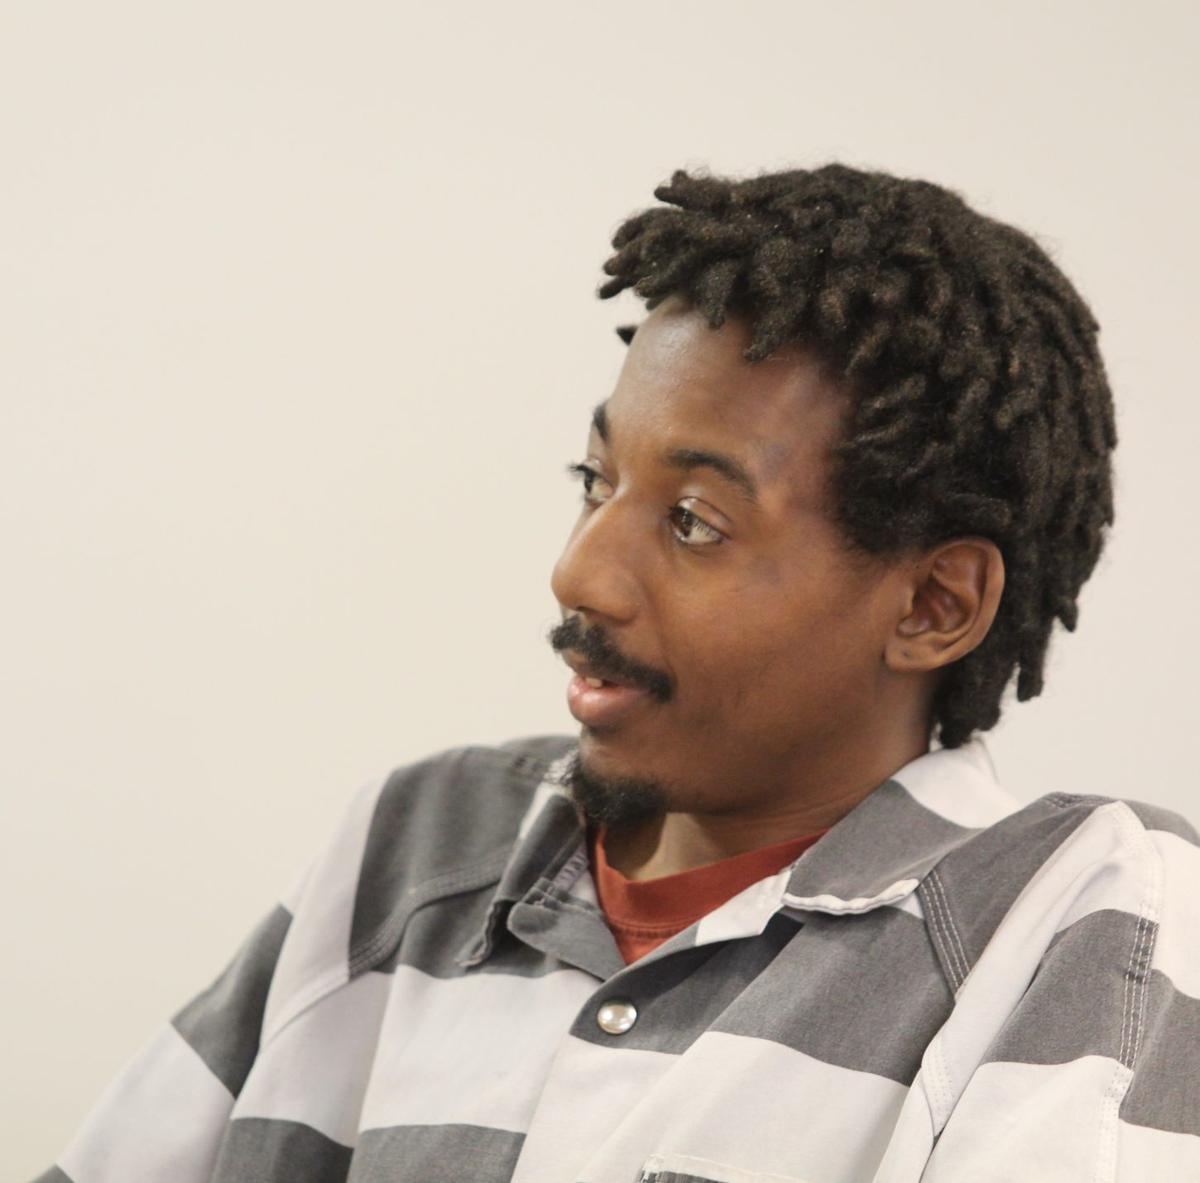 030617jr-aldridge-sentencing